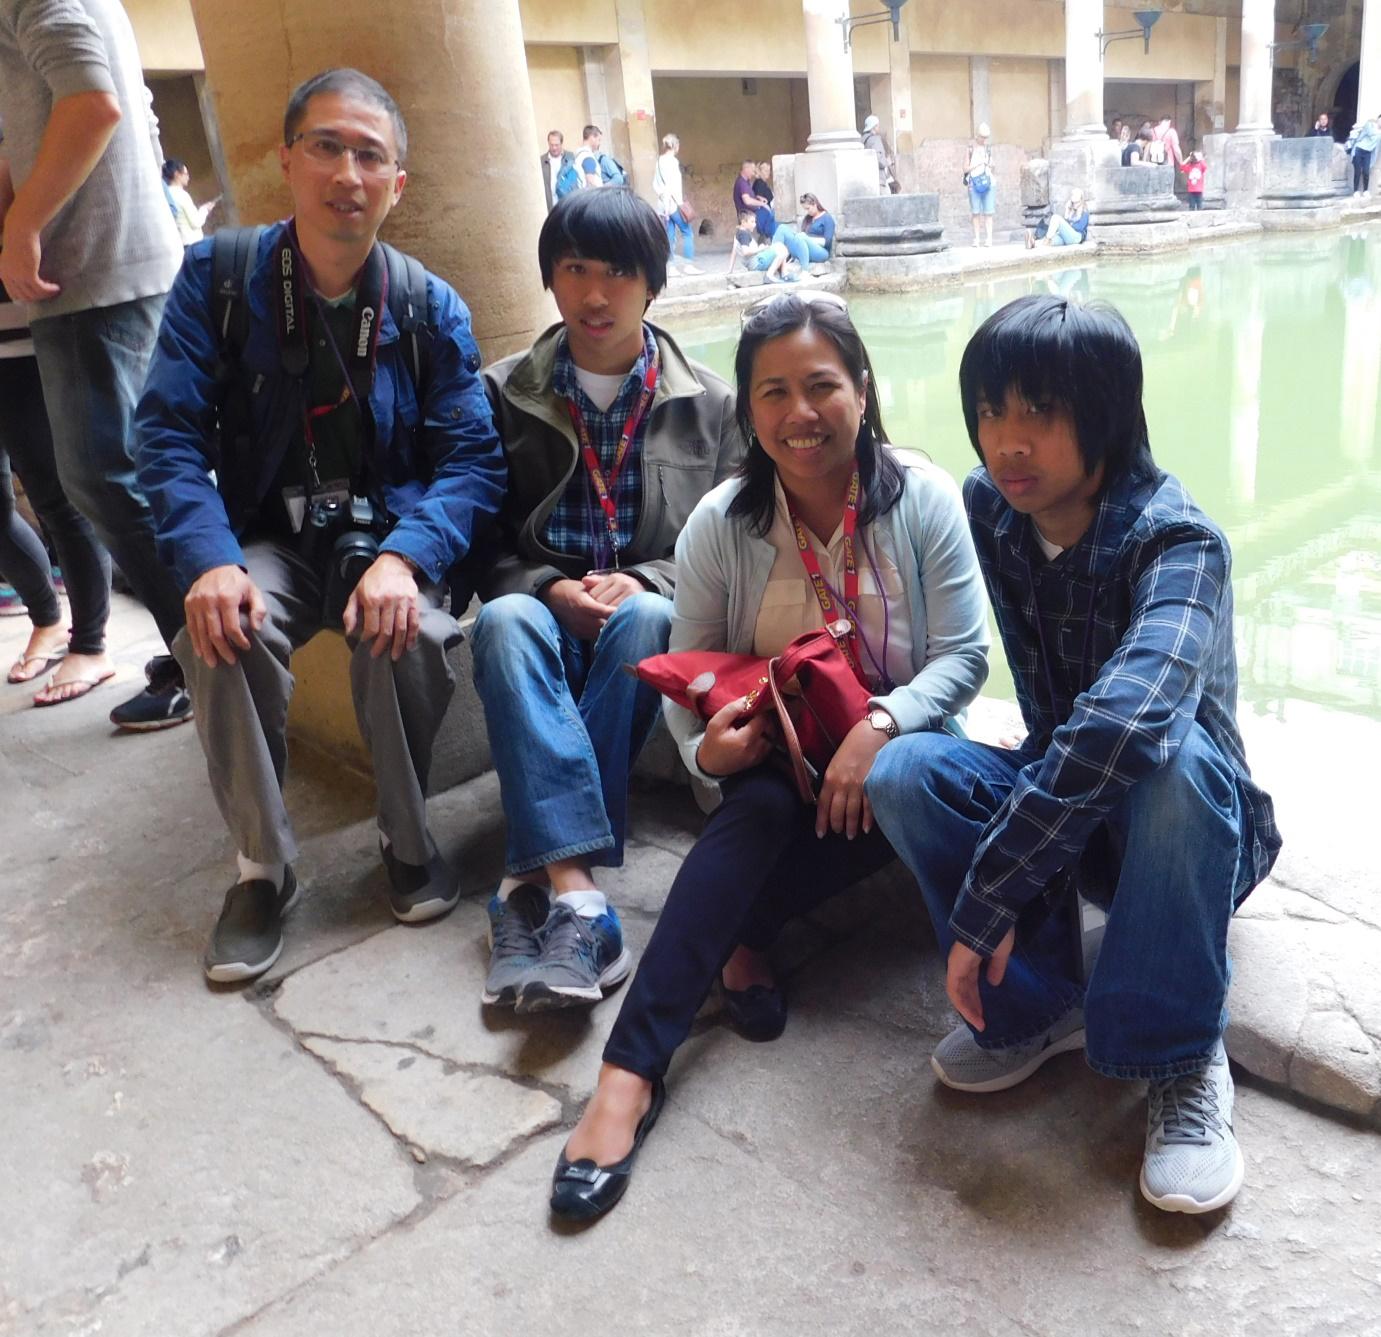 Robert, Ian, Lulu, and Eric Kong